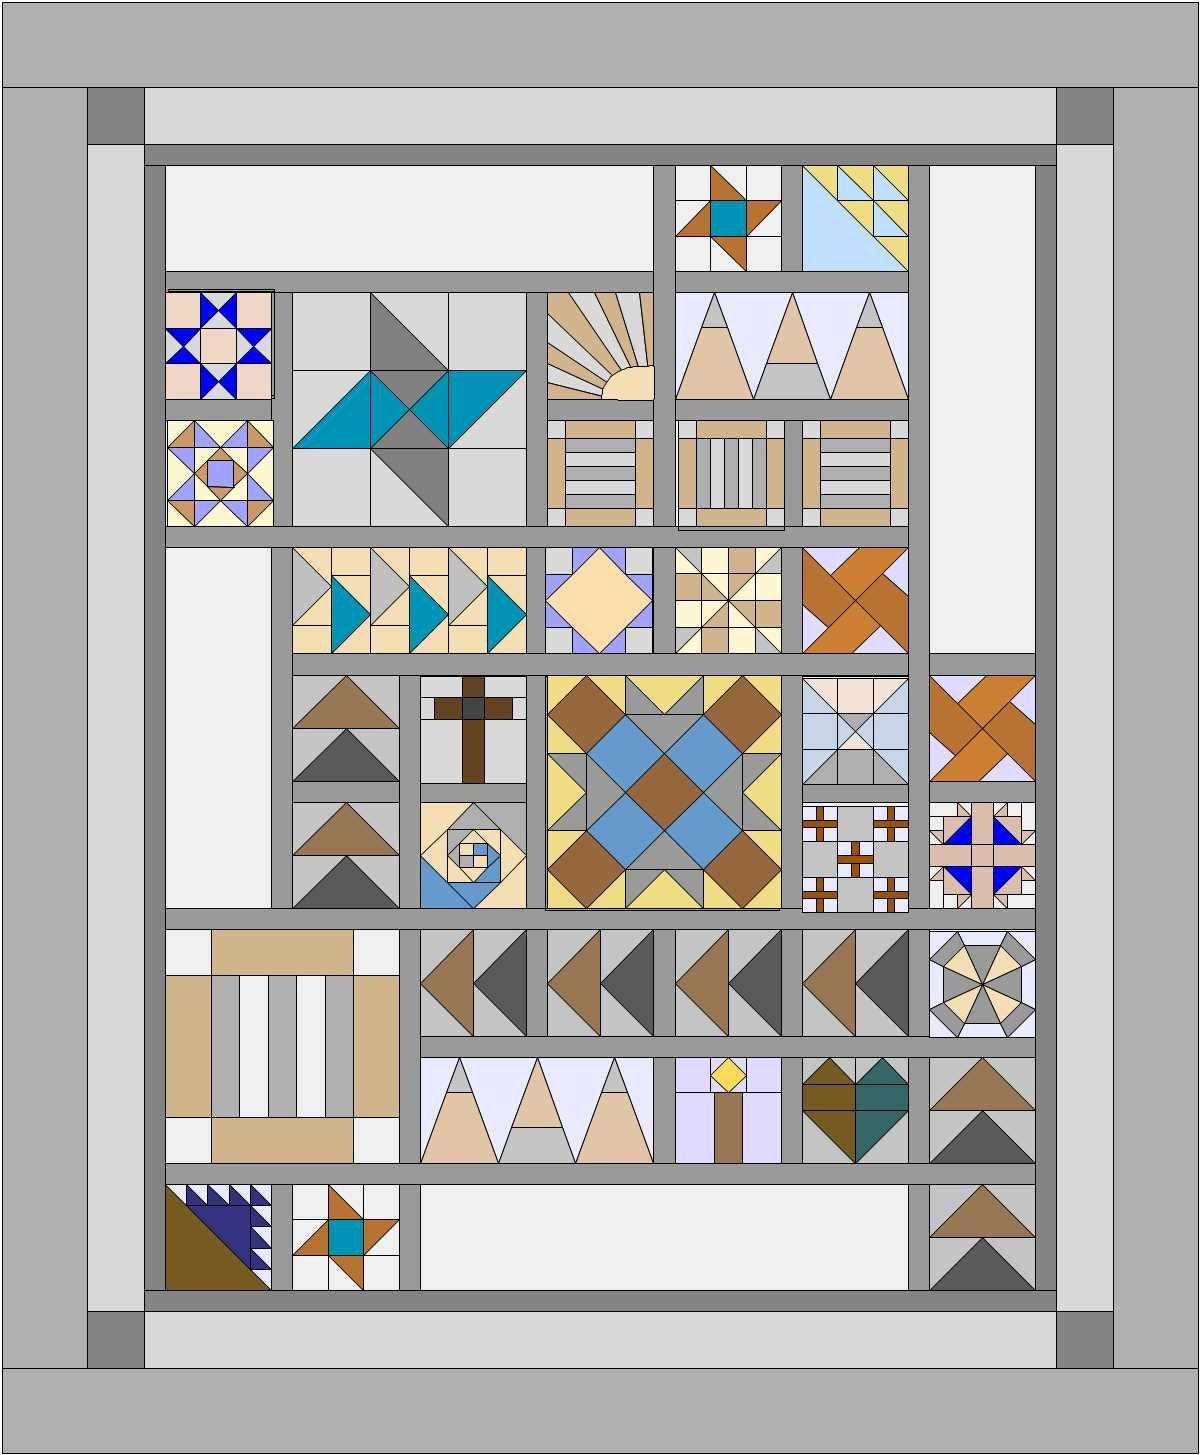 Songs of Faith Wholesale Reproducible Pattern Series - copy